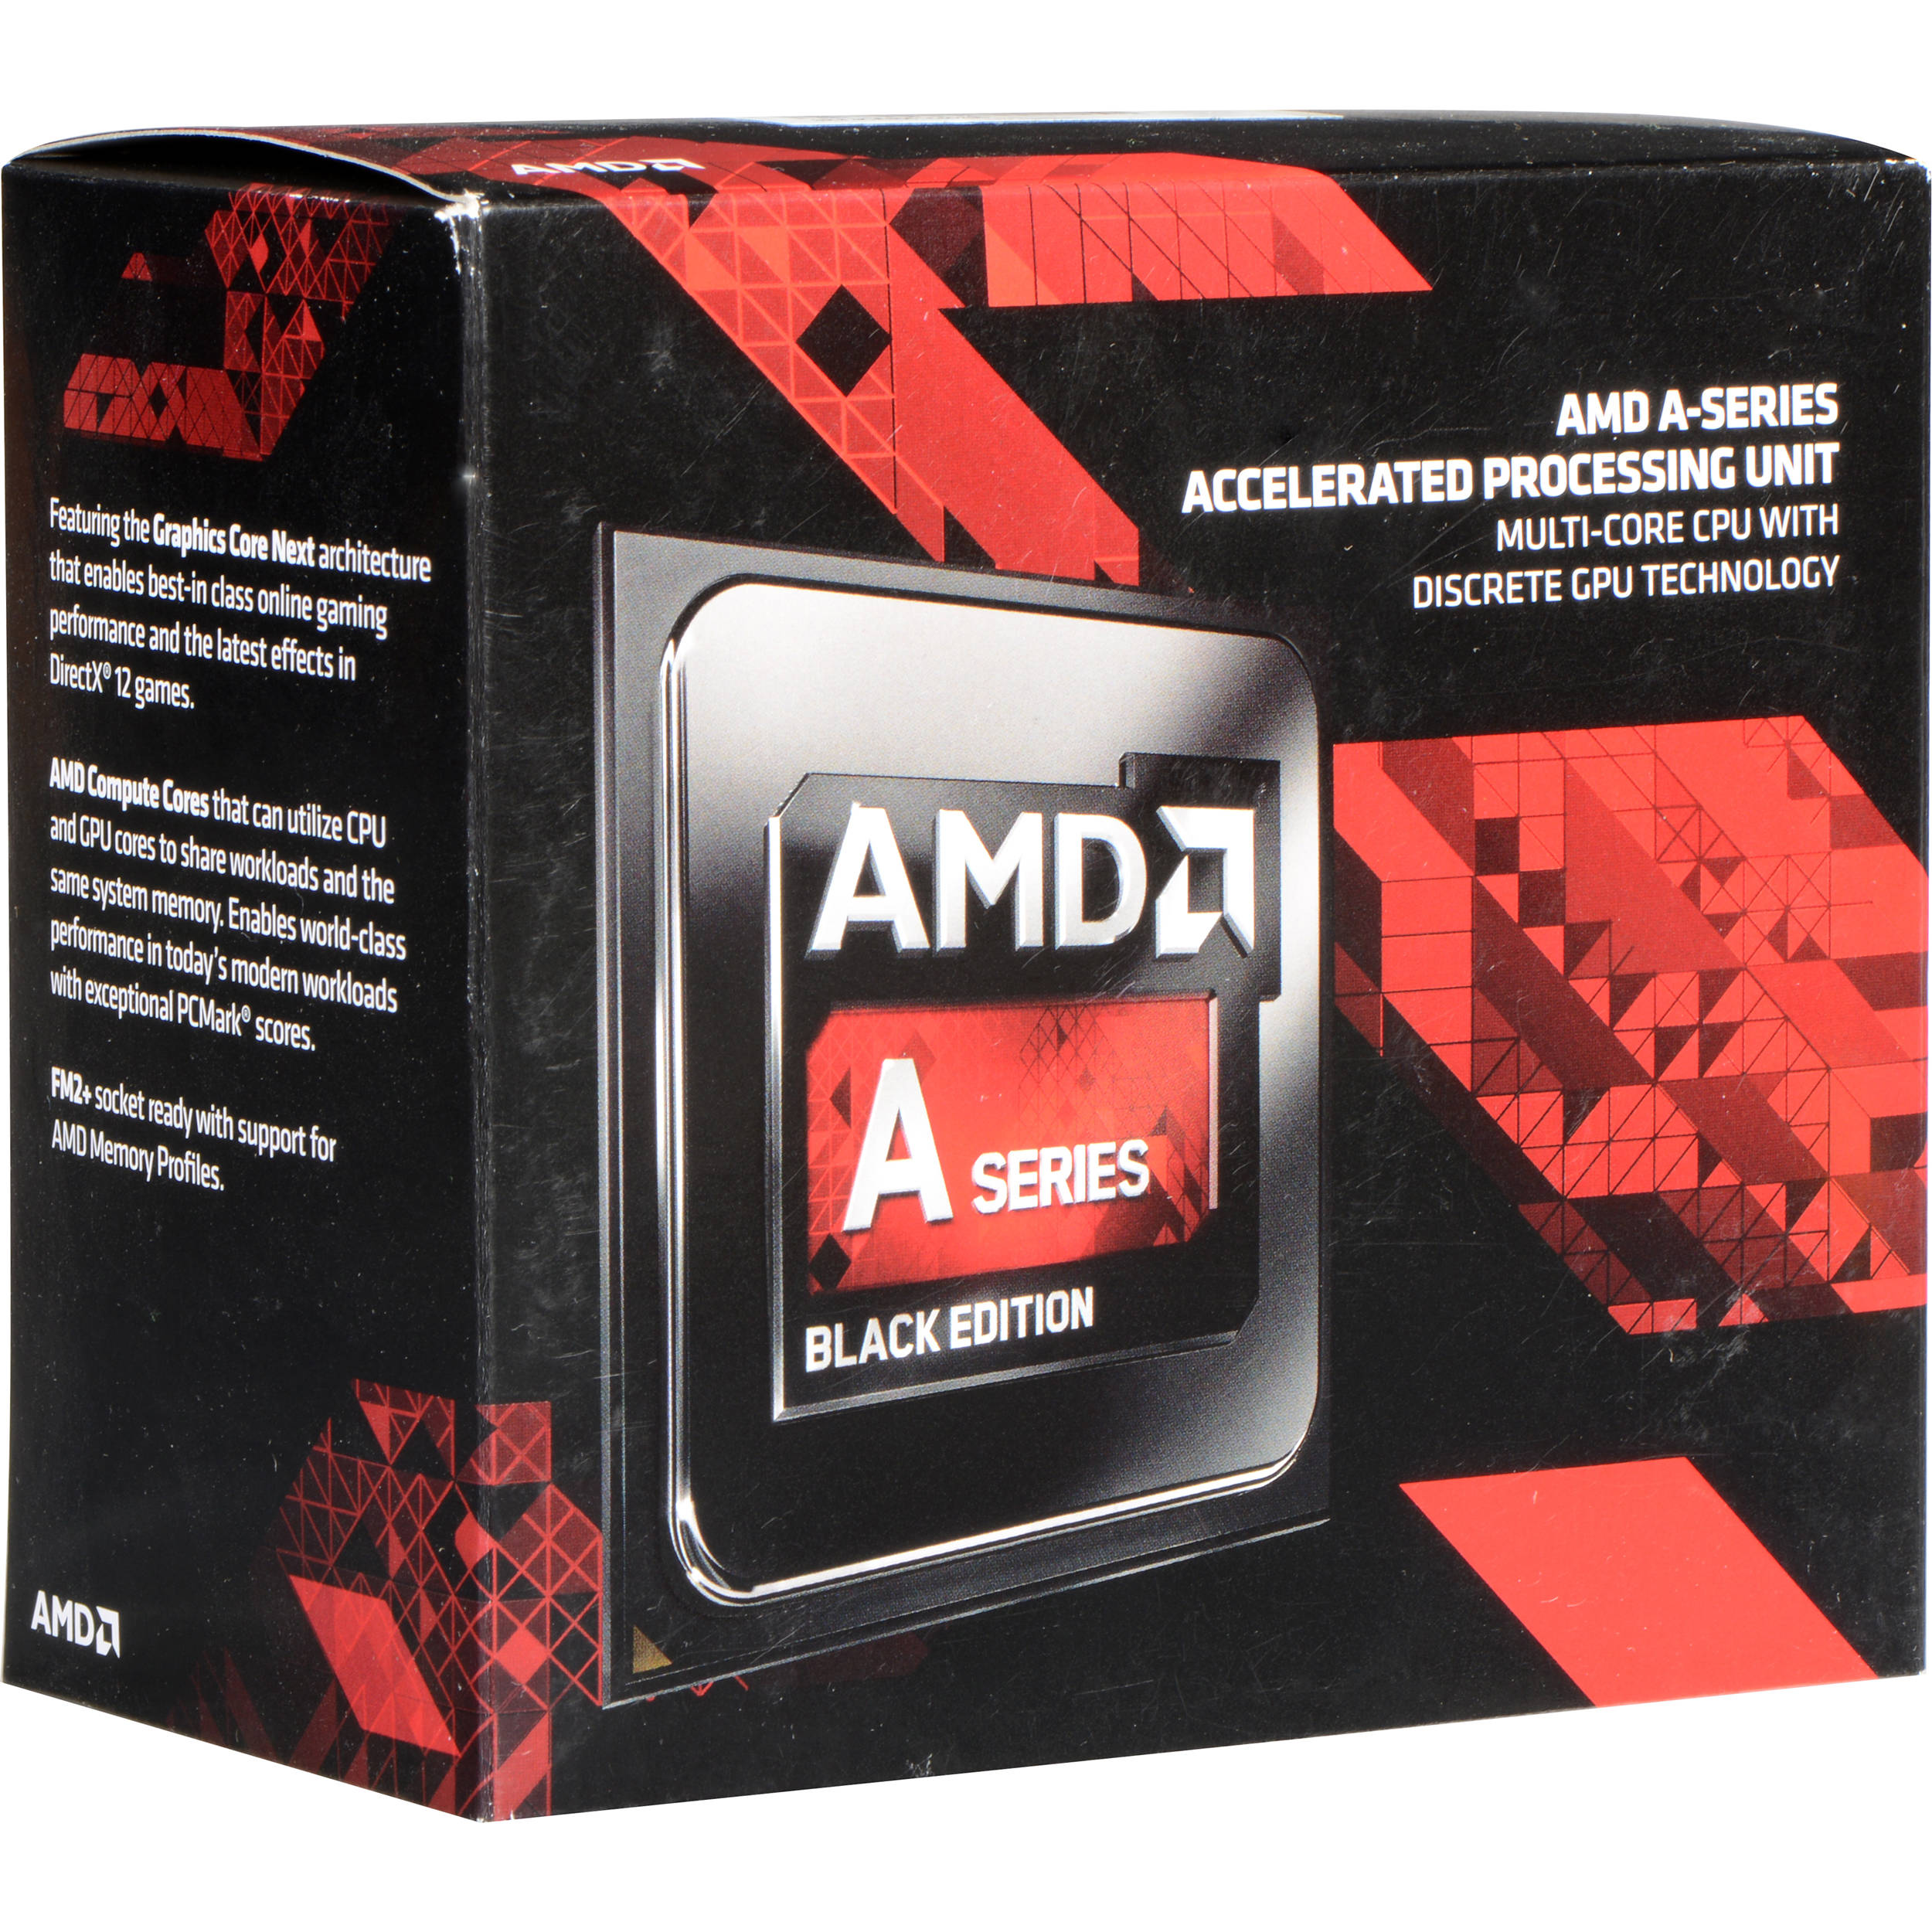 AMD A10-7860K 3 6 GHz Quad-Core FM2+ Processor